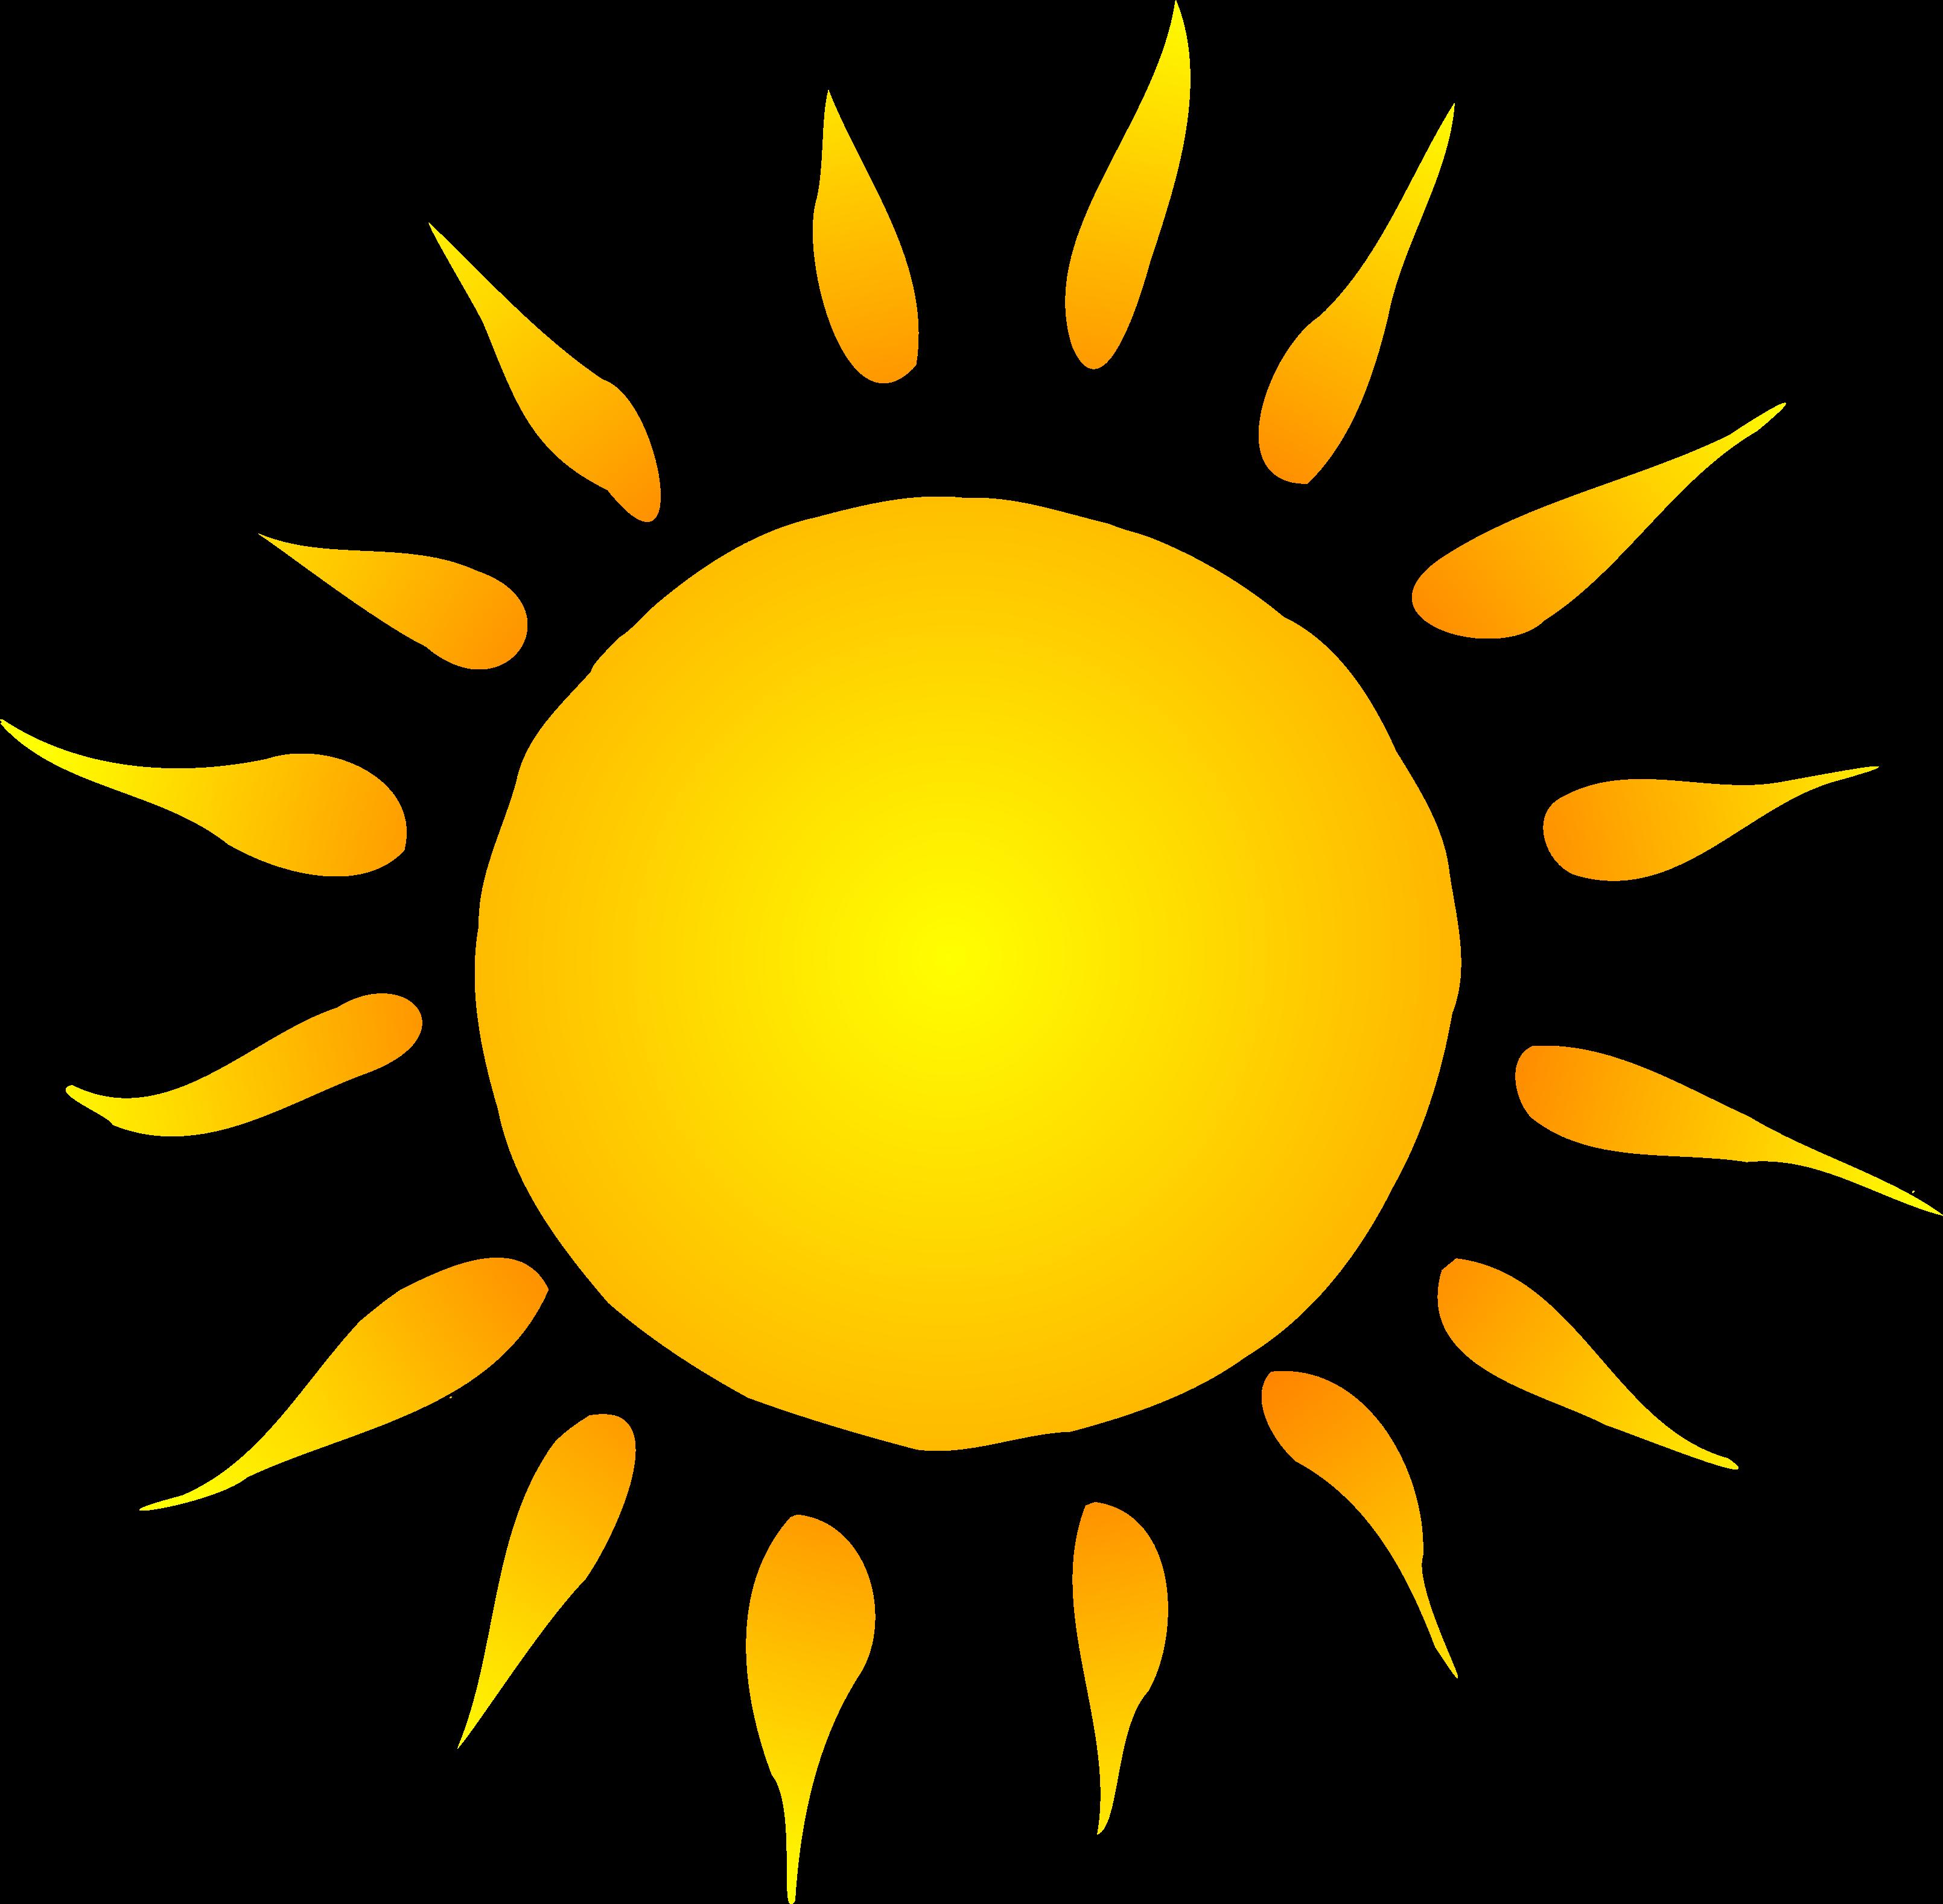 Sun Clip Art: 4 Clipart Sun (PNG Transparent)